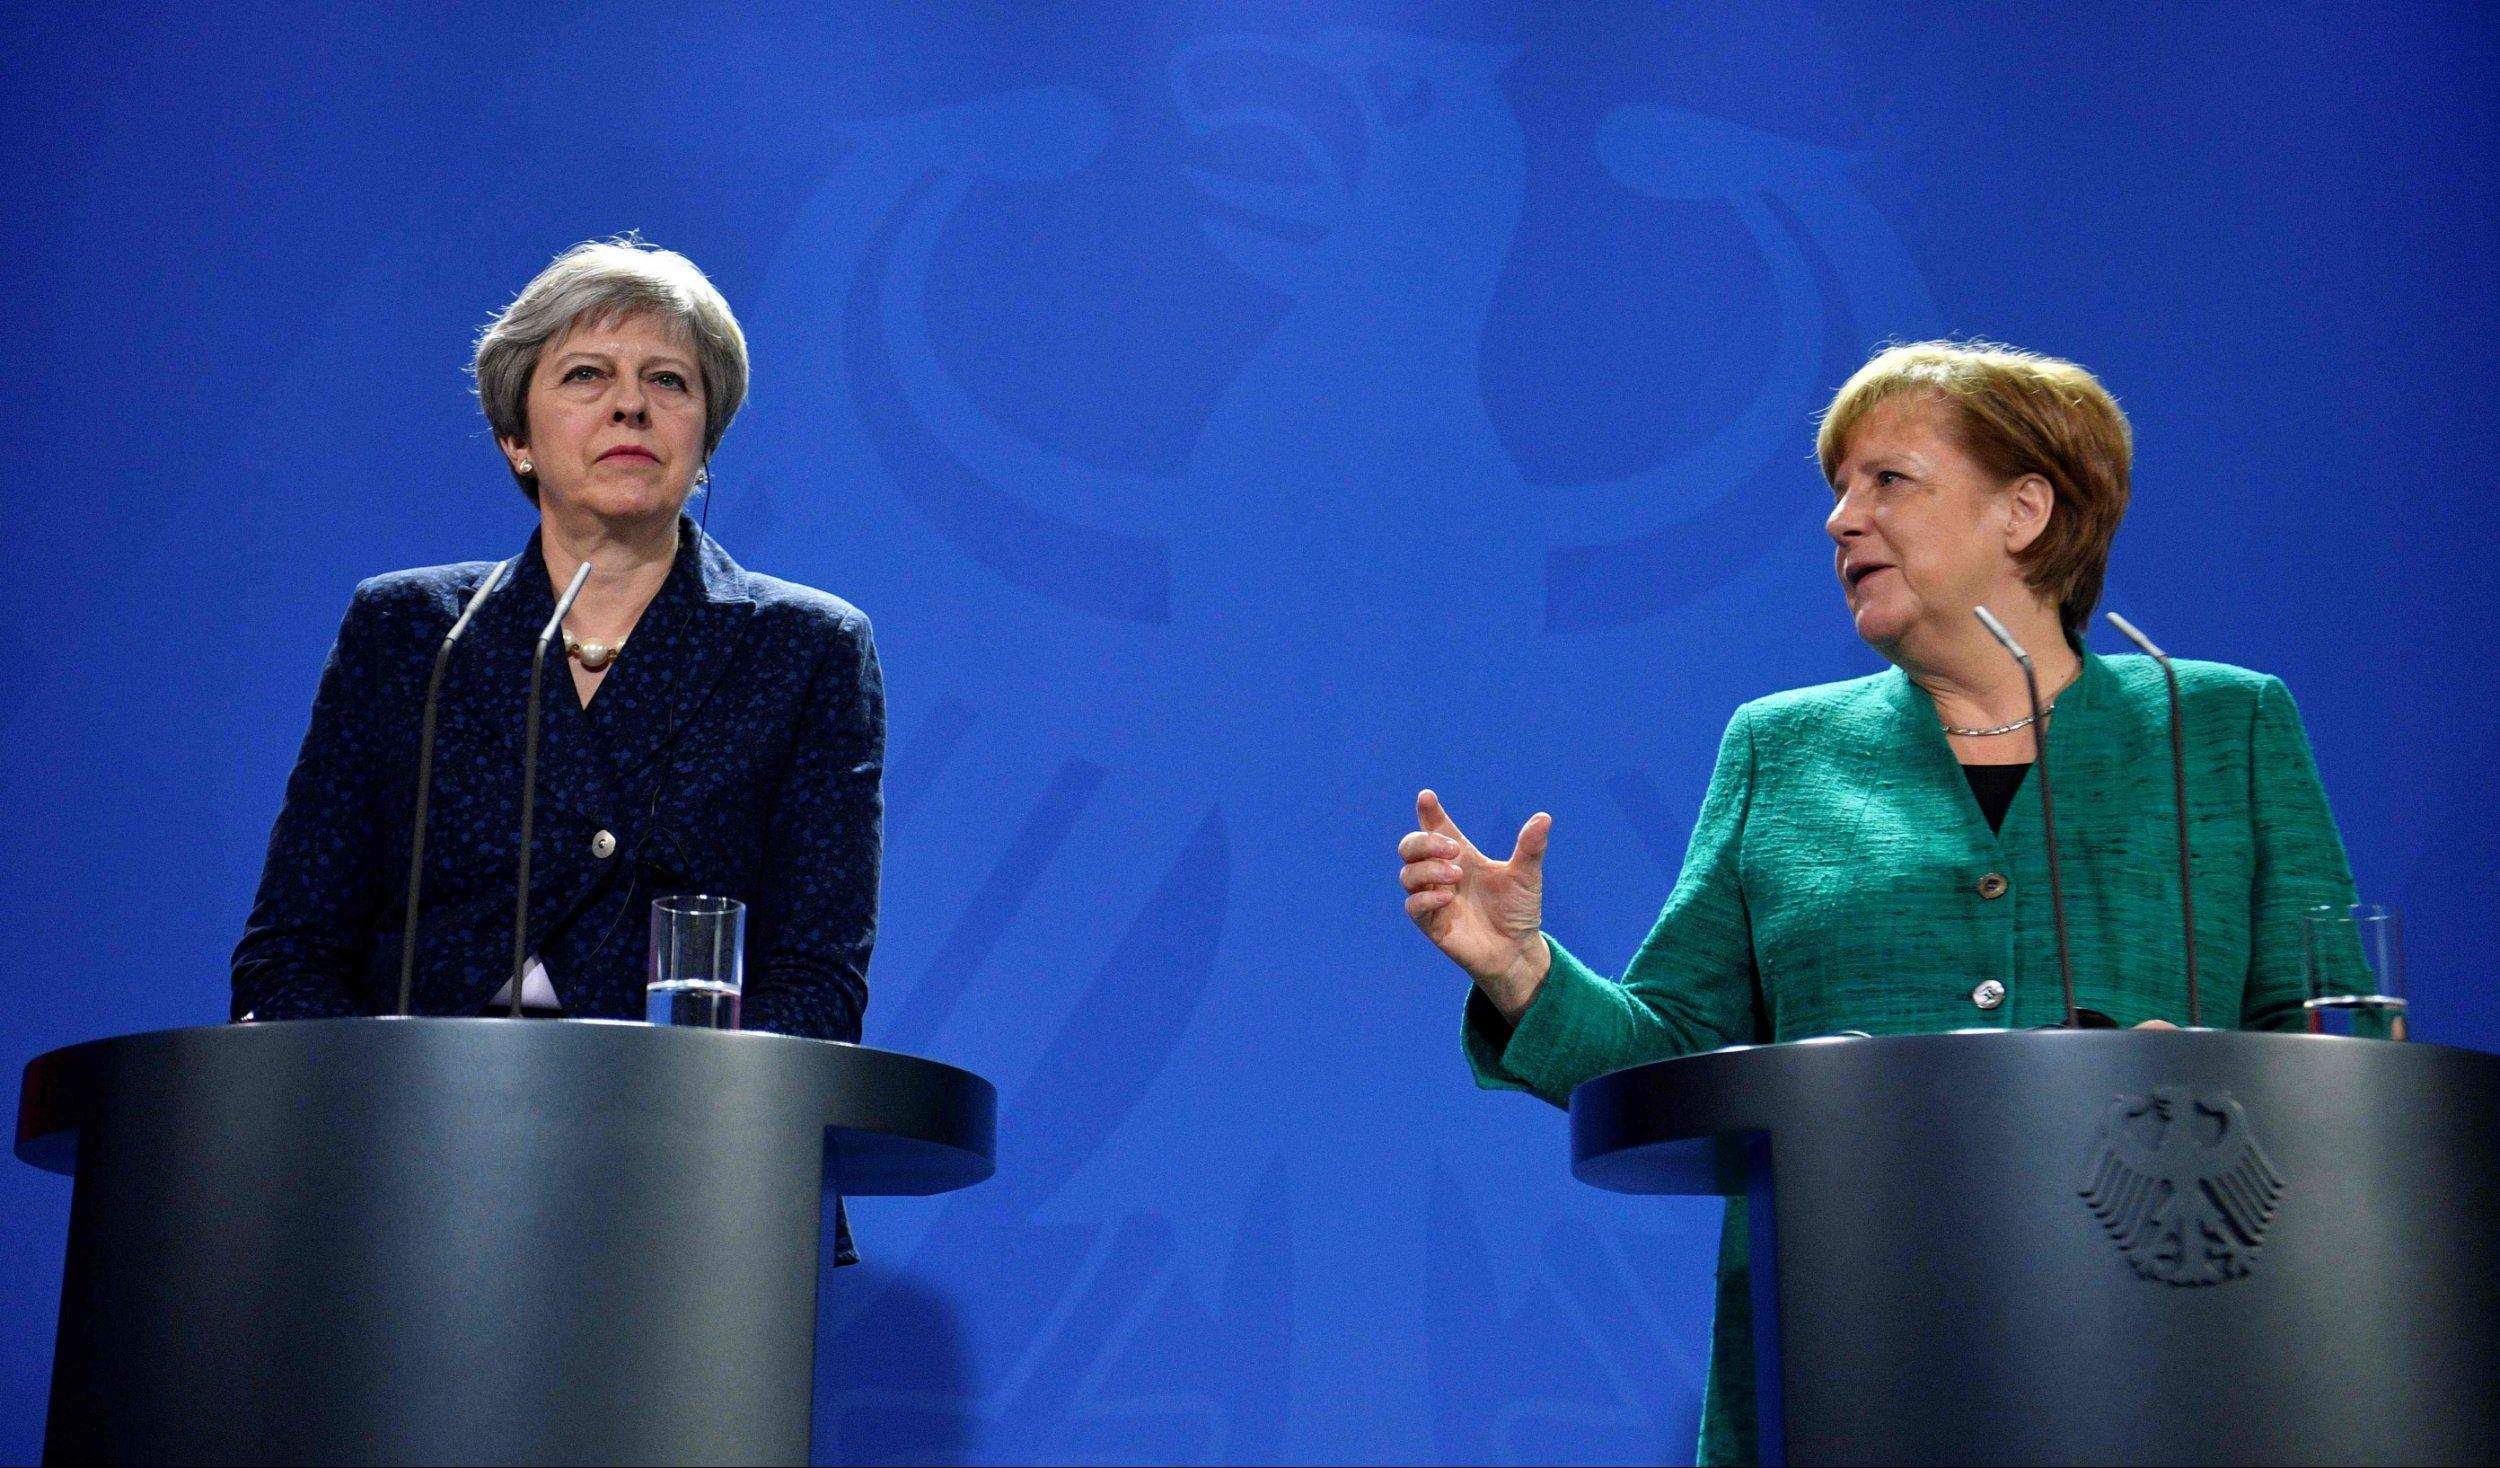 Angela Merkel says Germany 'deplores' Brexit